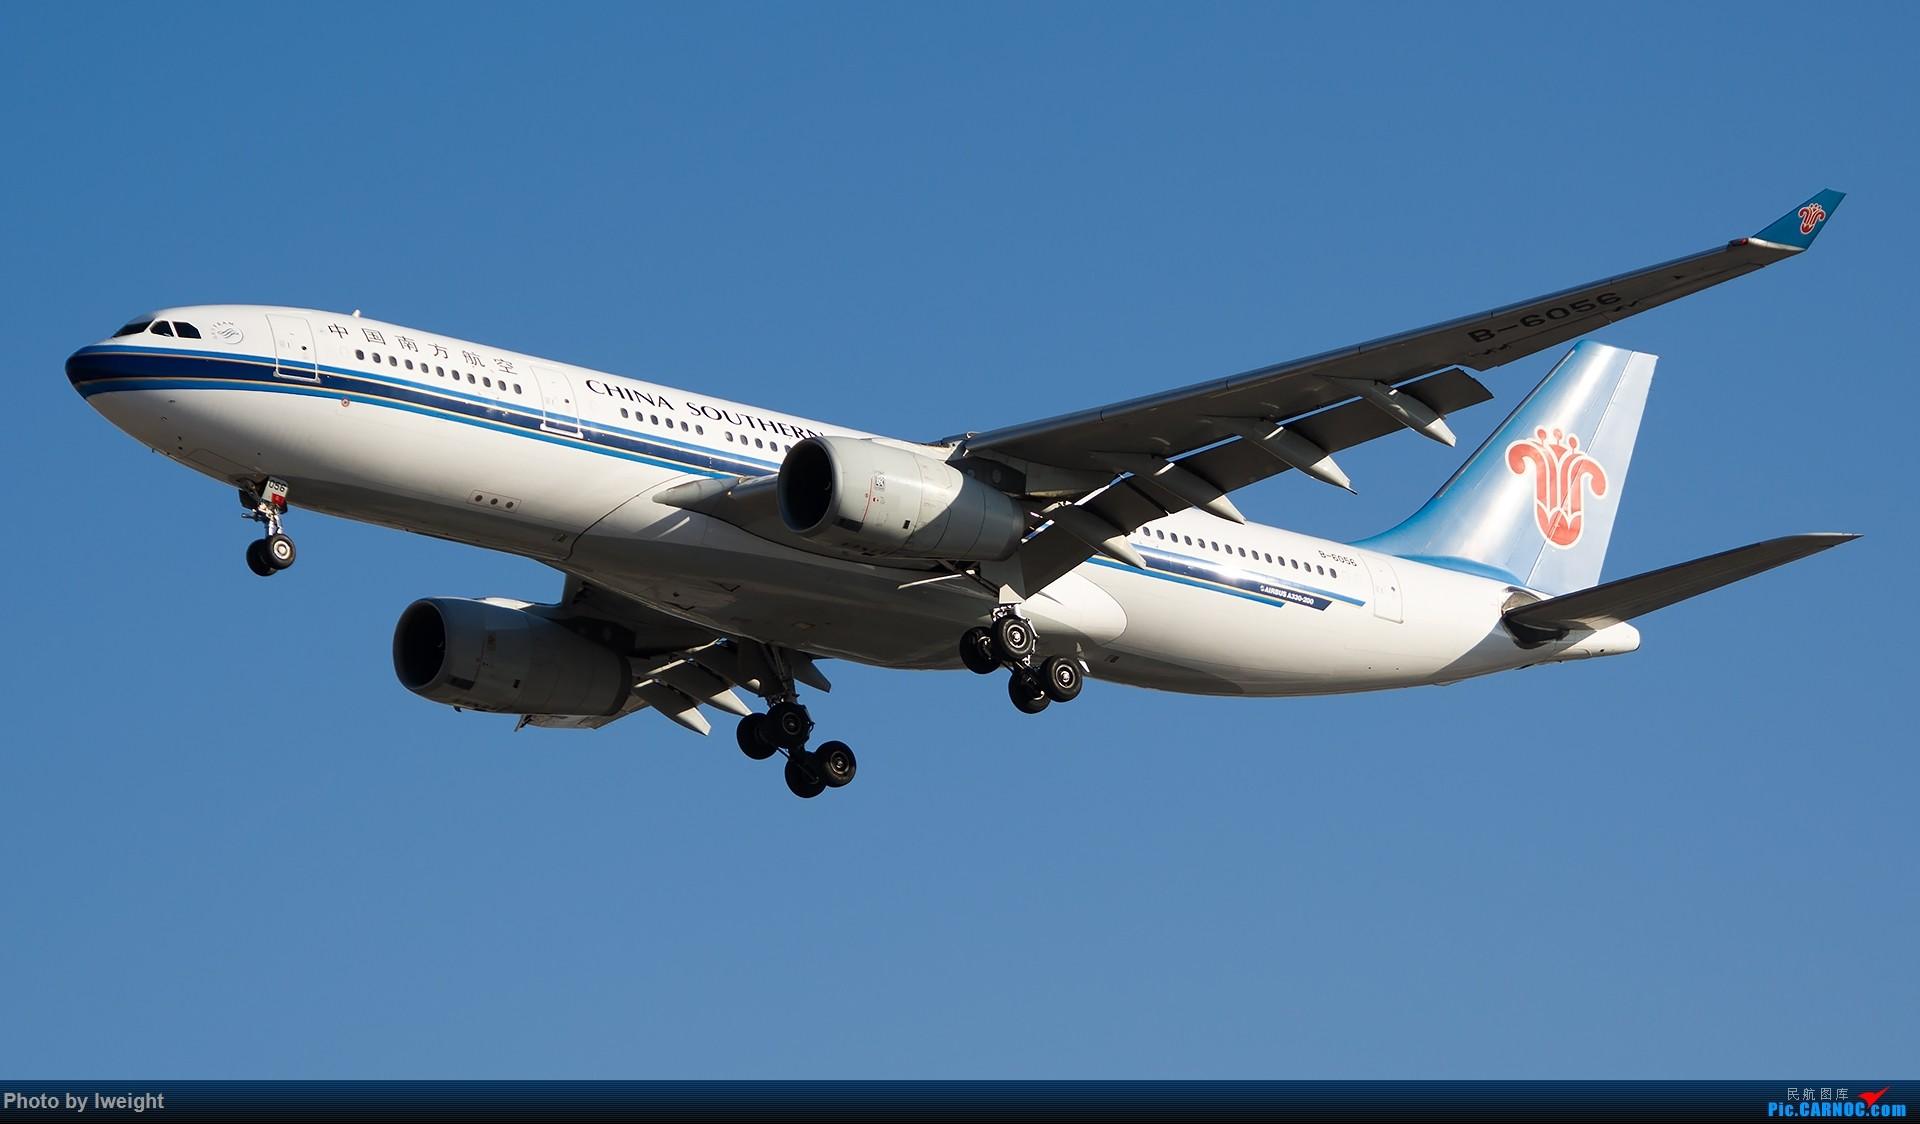 Re:[原创]北京难得的好天气,随手拍了一些渣图【2015-01-27】 AIRBUS A330-200 B-6056 中国北京首都国际机场